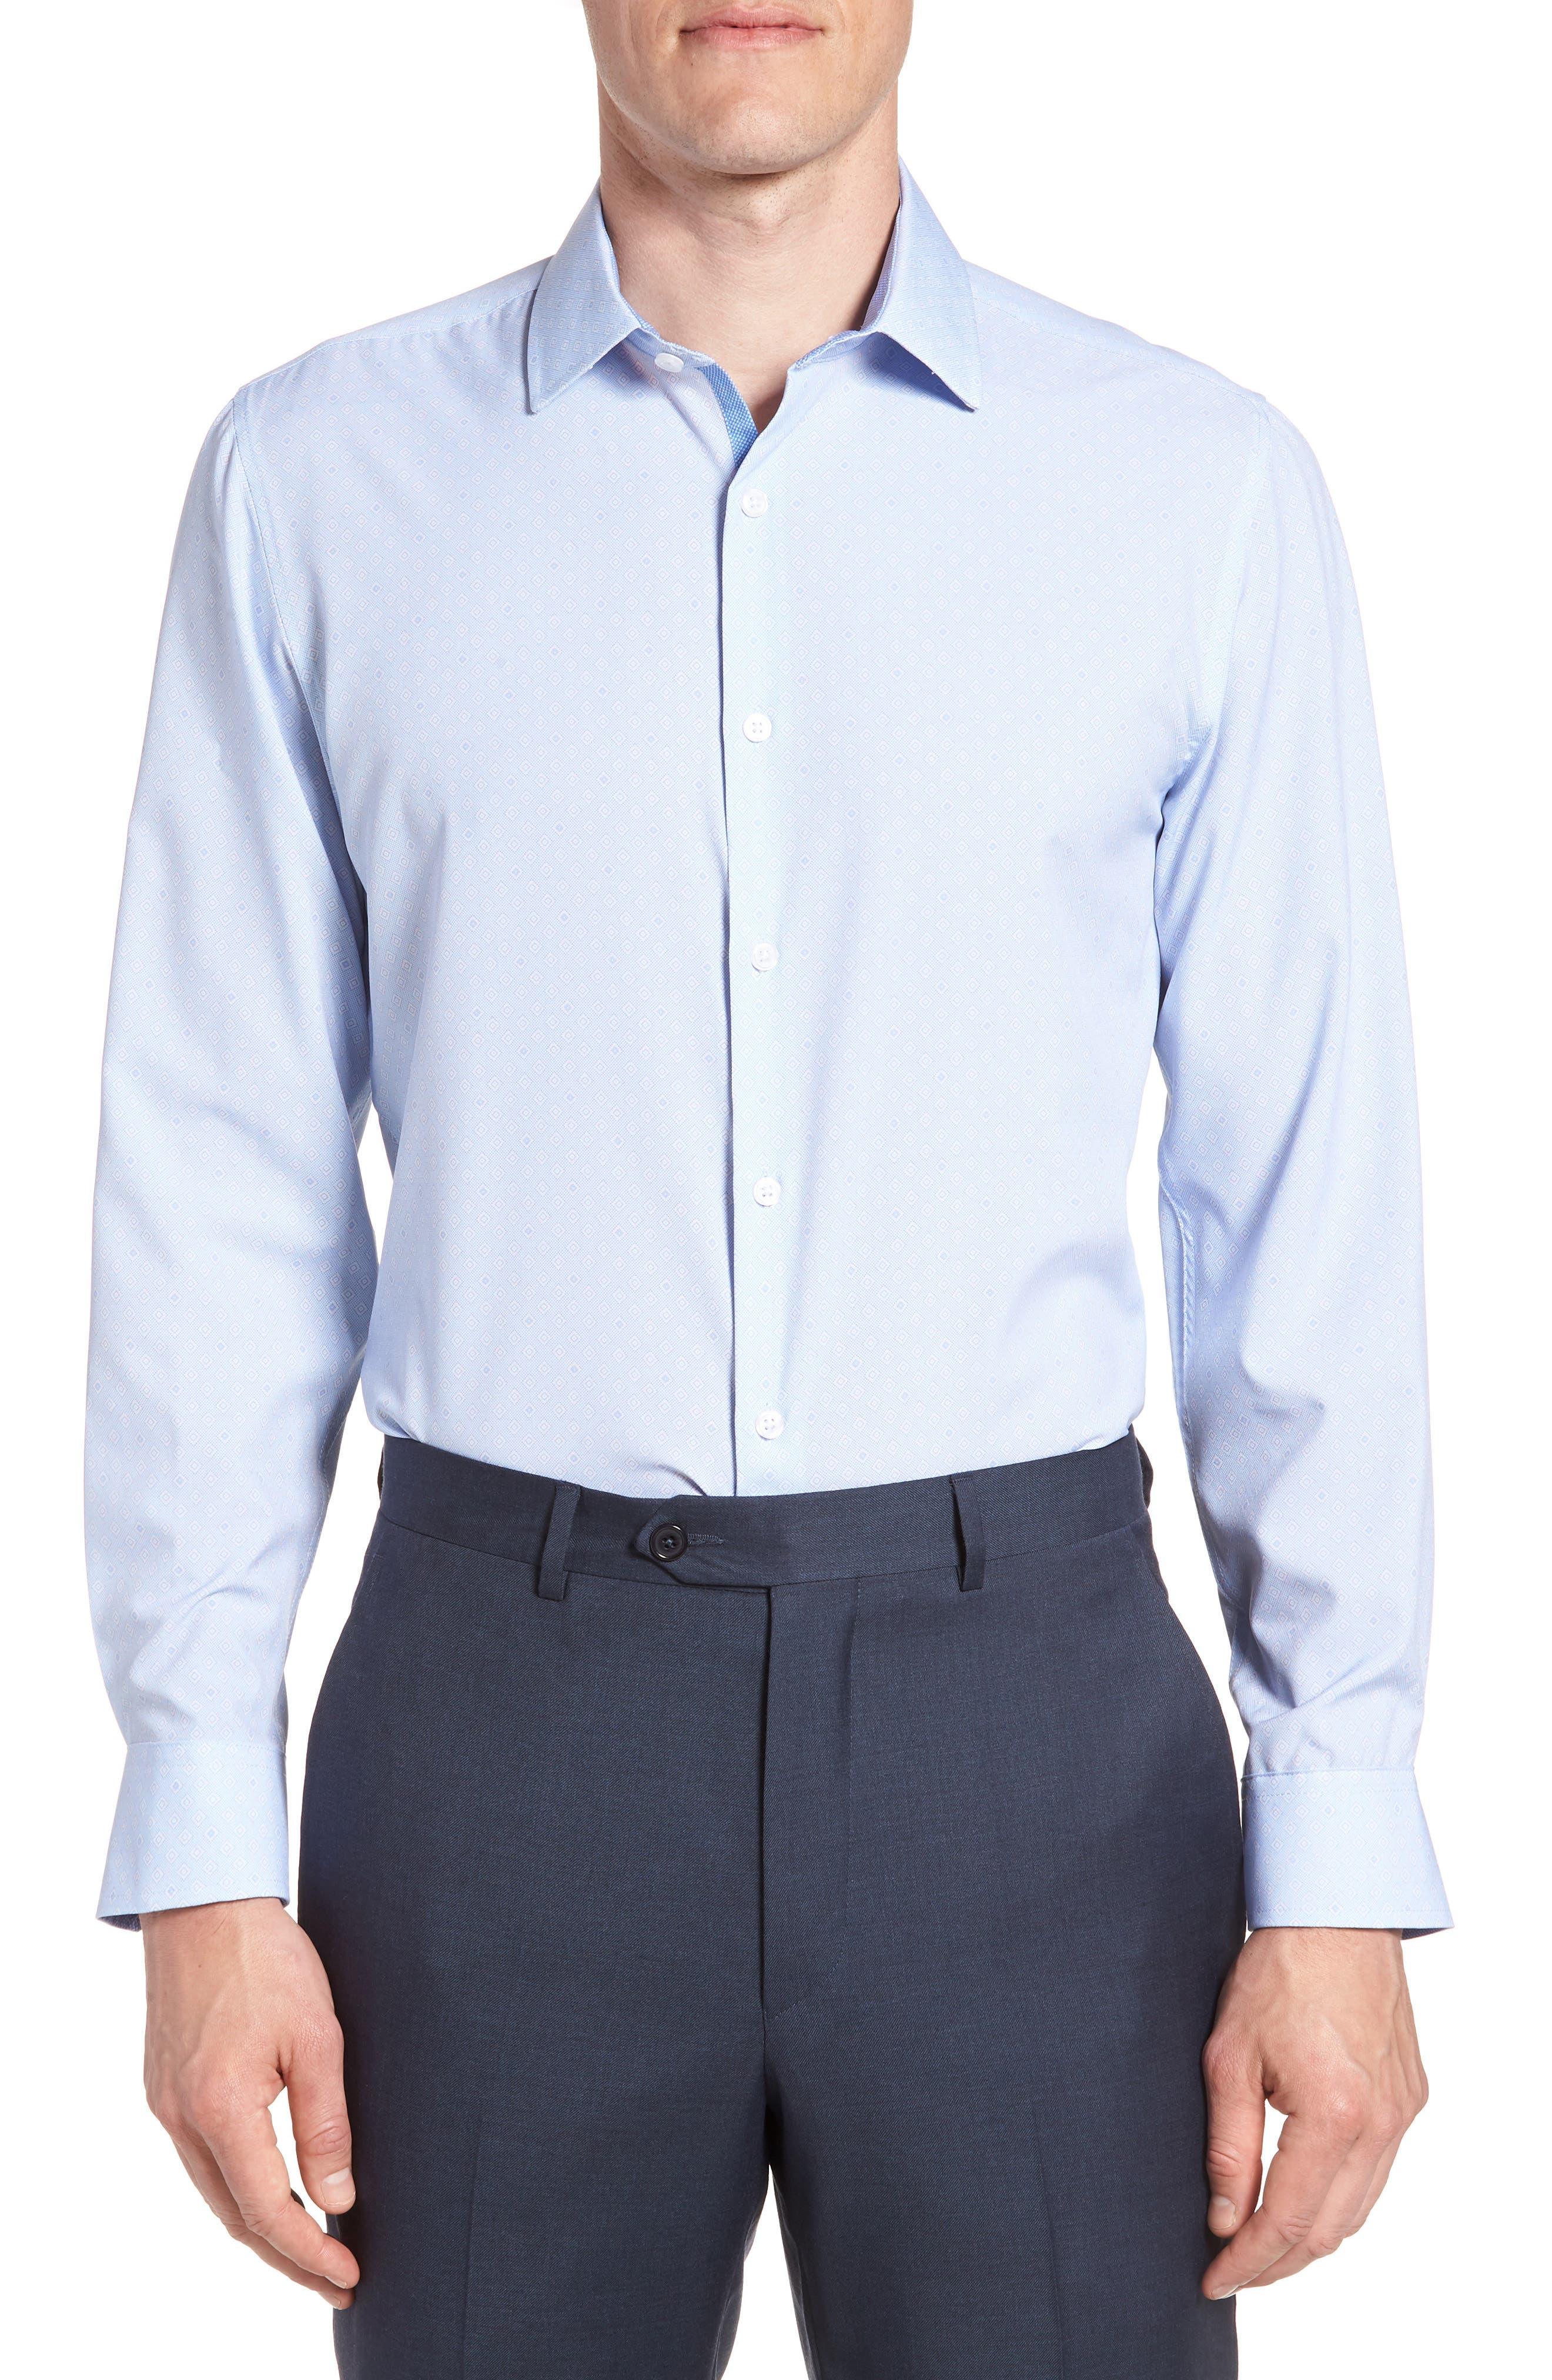 Trim Fit Geometric 4-Way Stretch Dress Shirt,                             Main thumbnail 1, color,                             BLUE